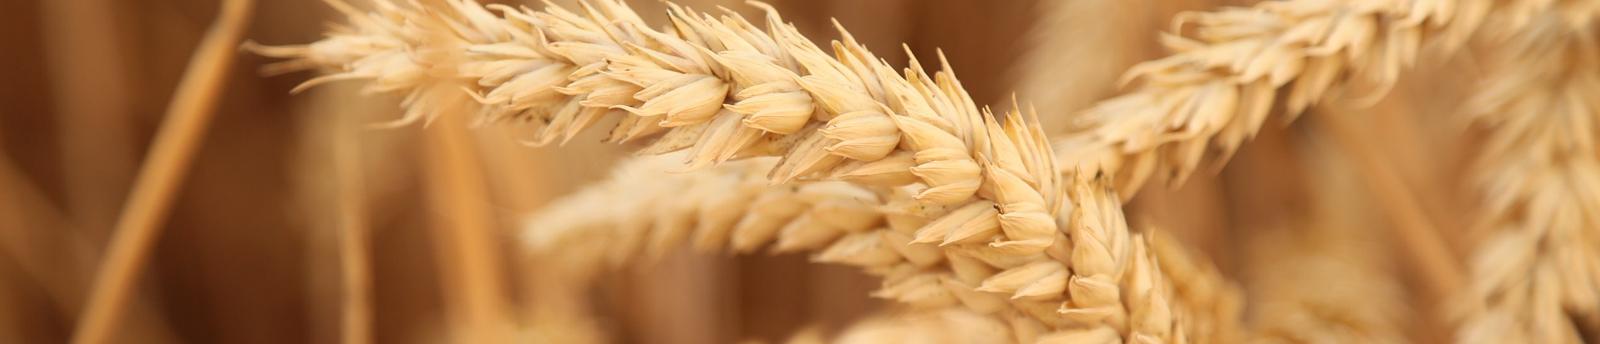 Common wheat - Campo de Tejada, Chickpea producers in Spain